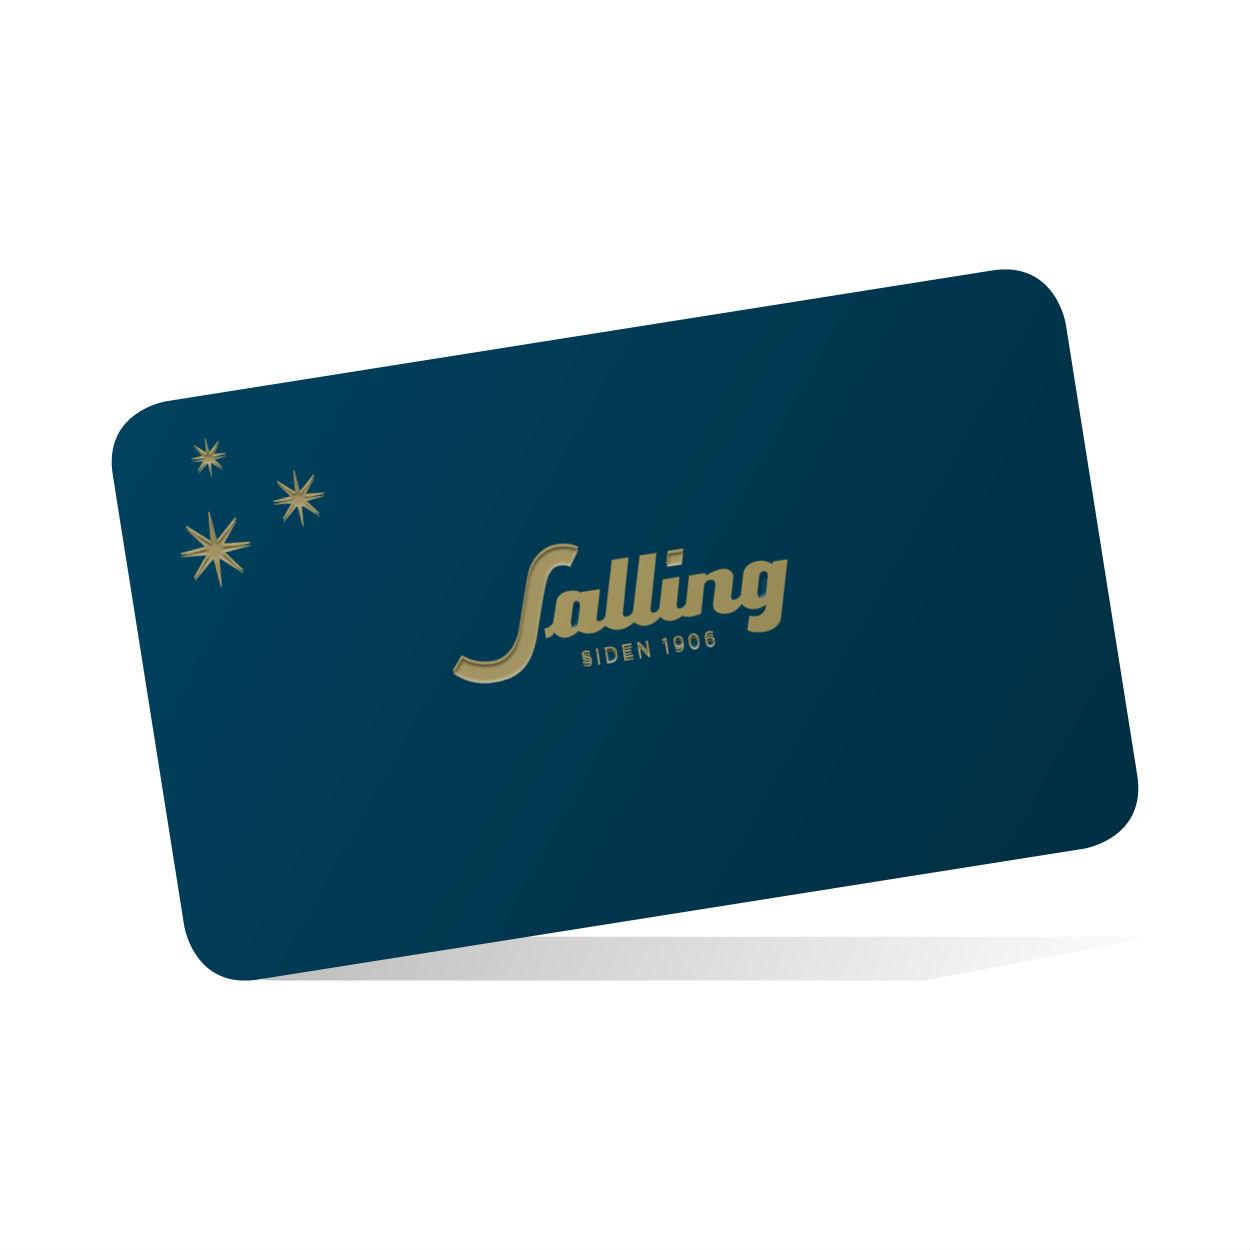 Salling gavekort - 350 kr